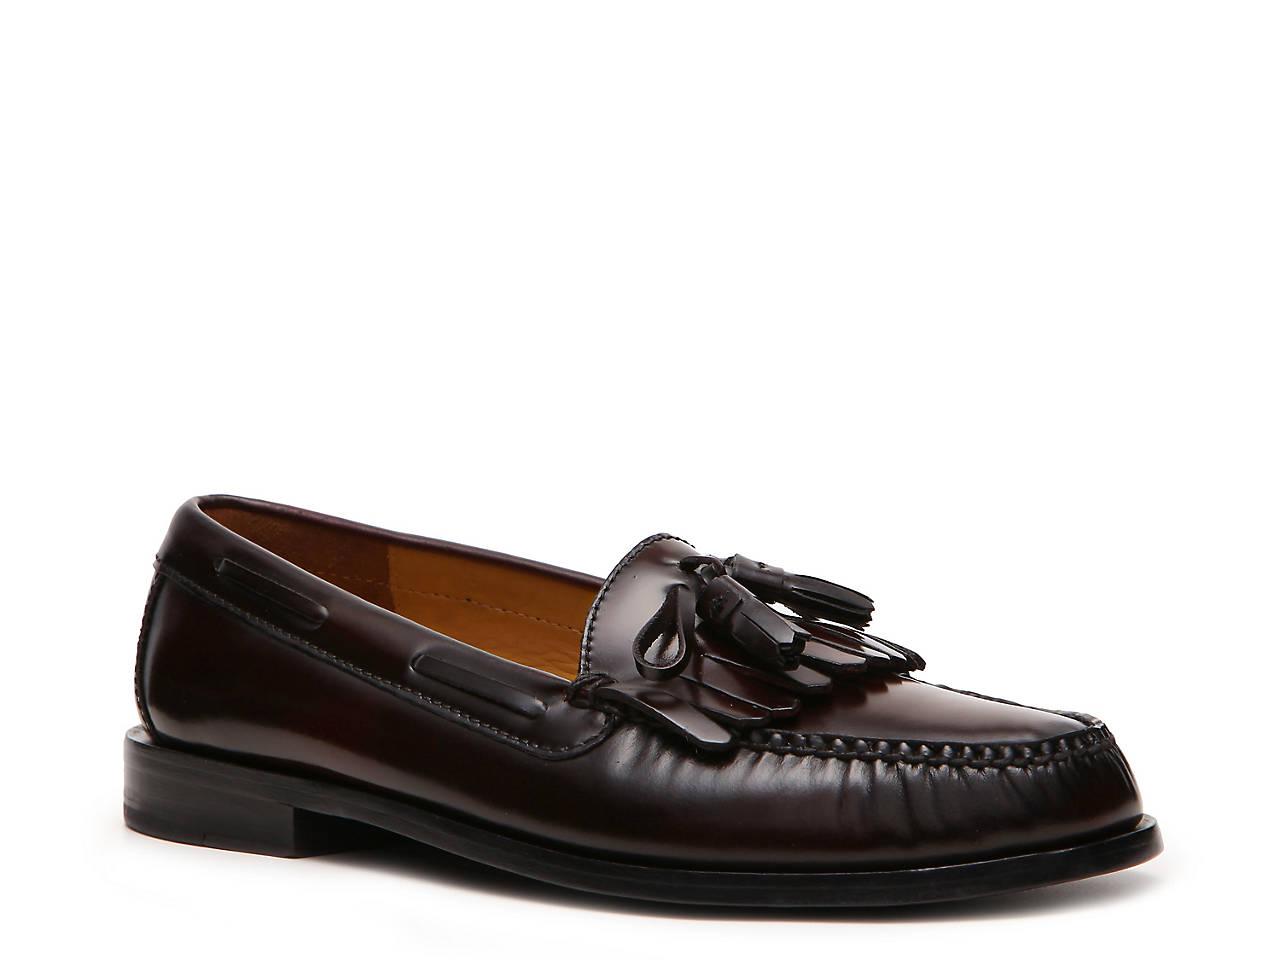 Pinchshawl II Tassel Loafer